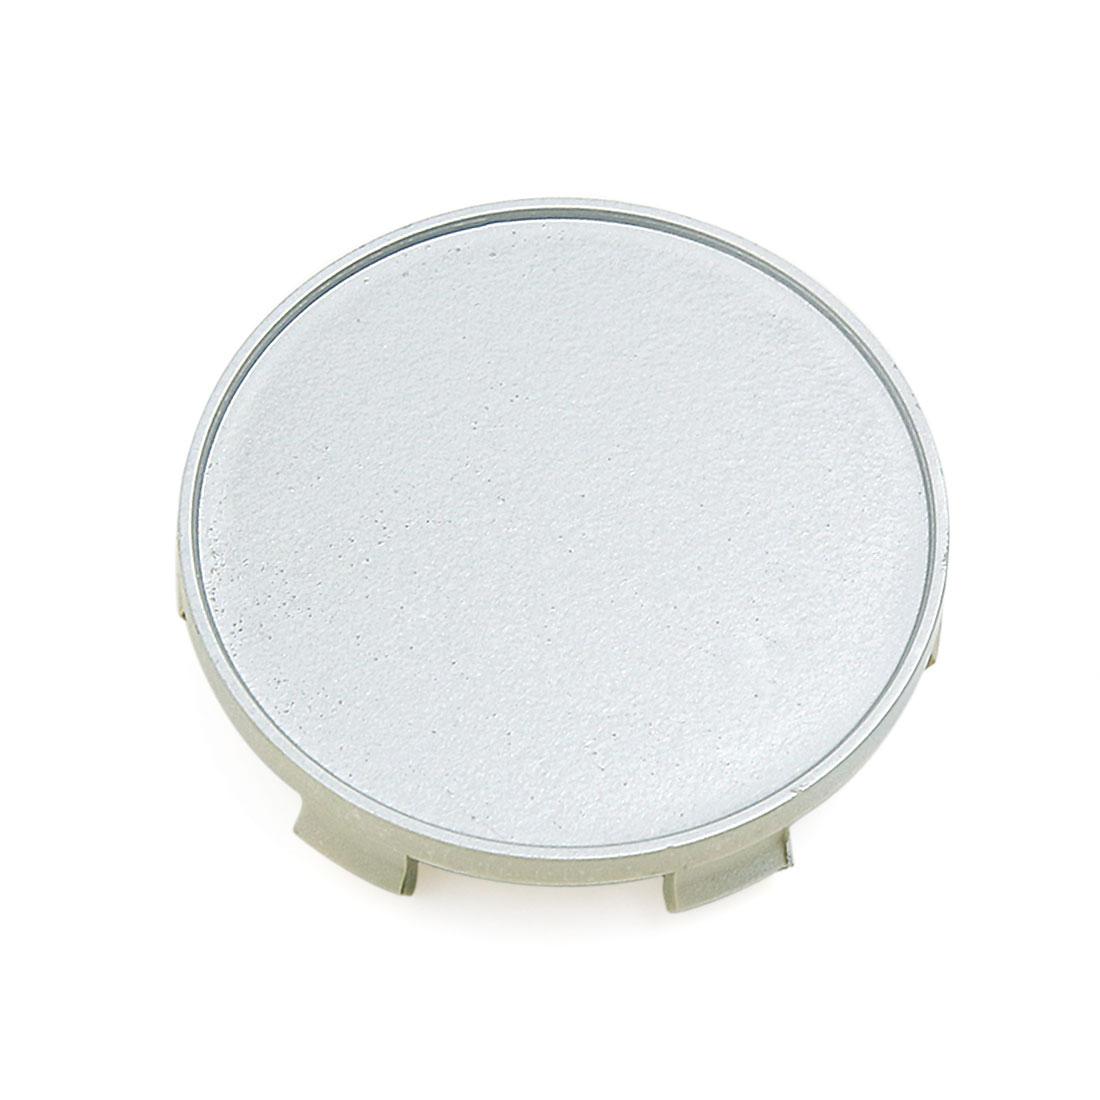 67mm Diameter 6Lugs Plastic Wheel Rims Center Hub Cover Cap for Car